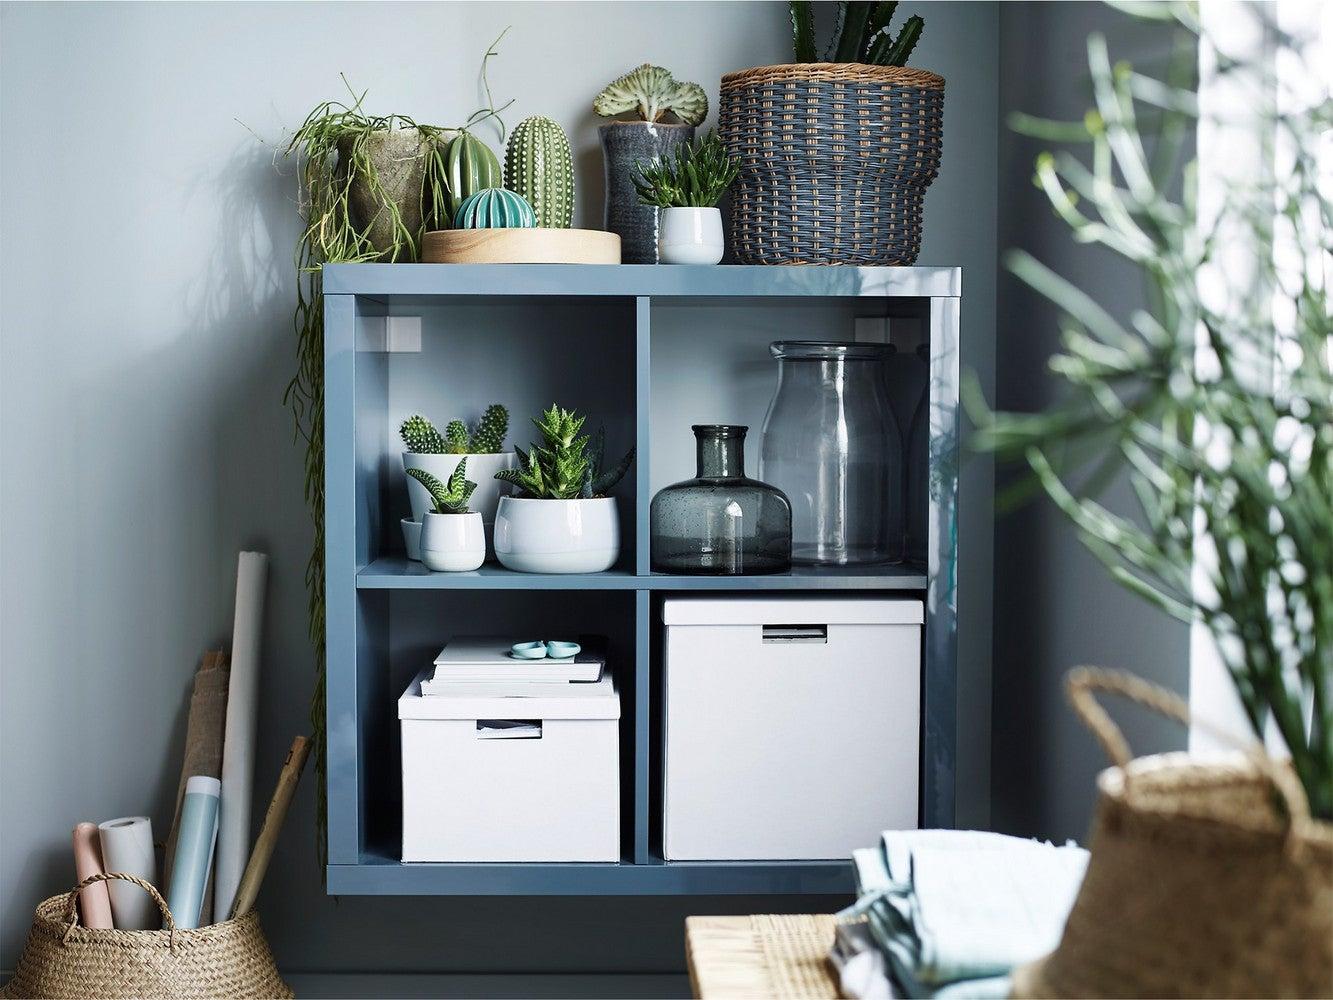 Easy Ikea Kallax Shelves Hacks To Upgrade Your Bookshelves